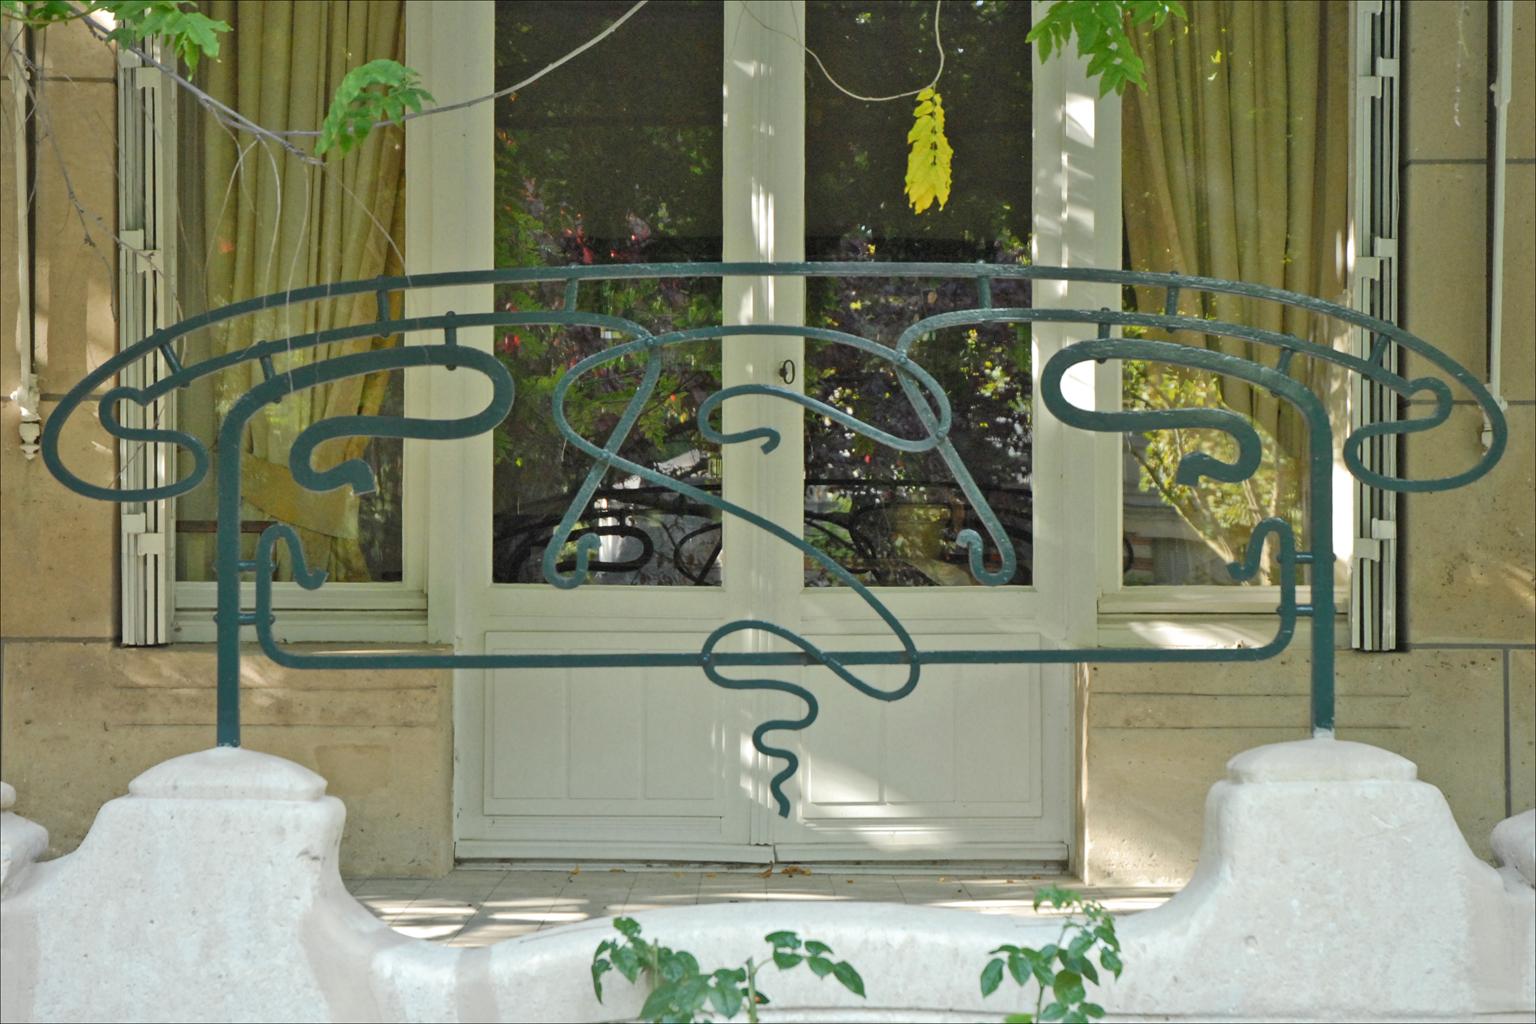 file grille en fer forg de la terrasse la hubloti re 6192781762 jpg wikimedia commons. Black Bedroom Furniture Sets. Home Design Ideas